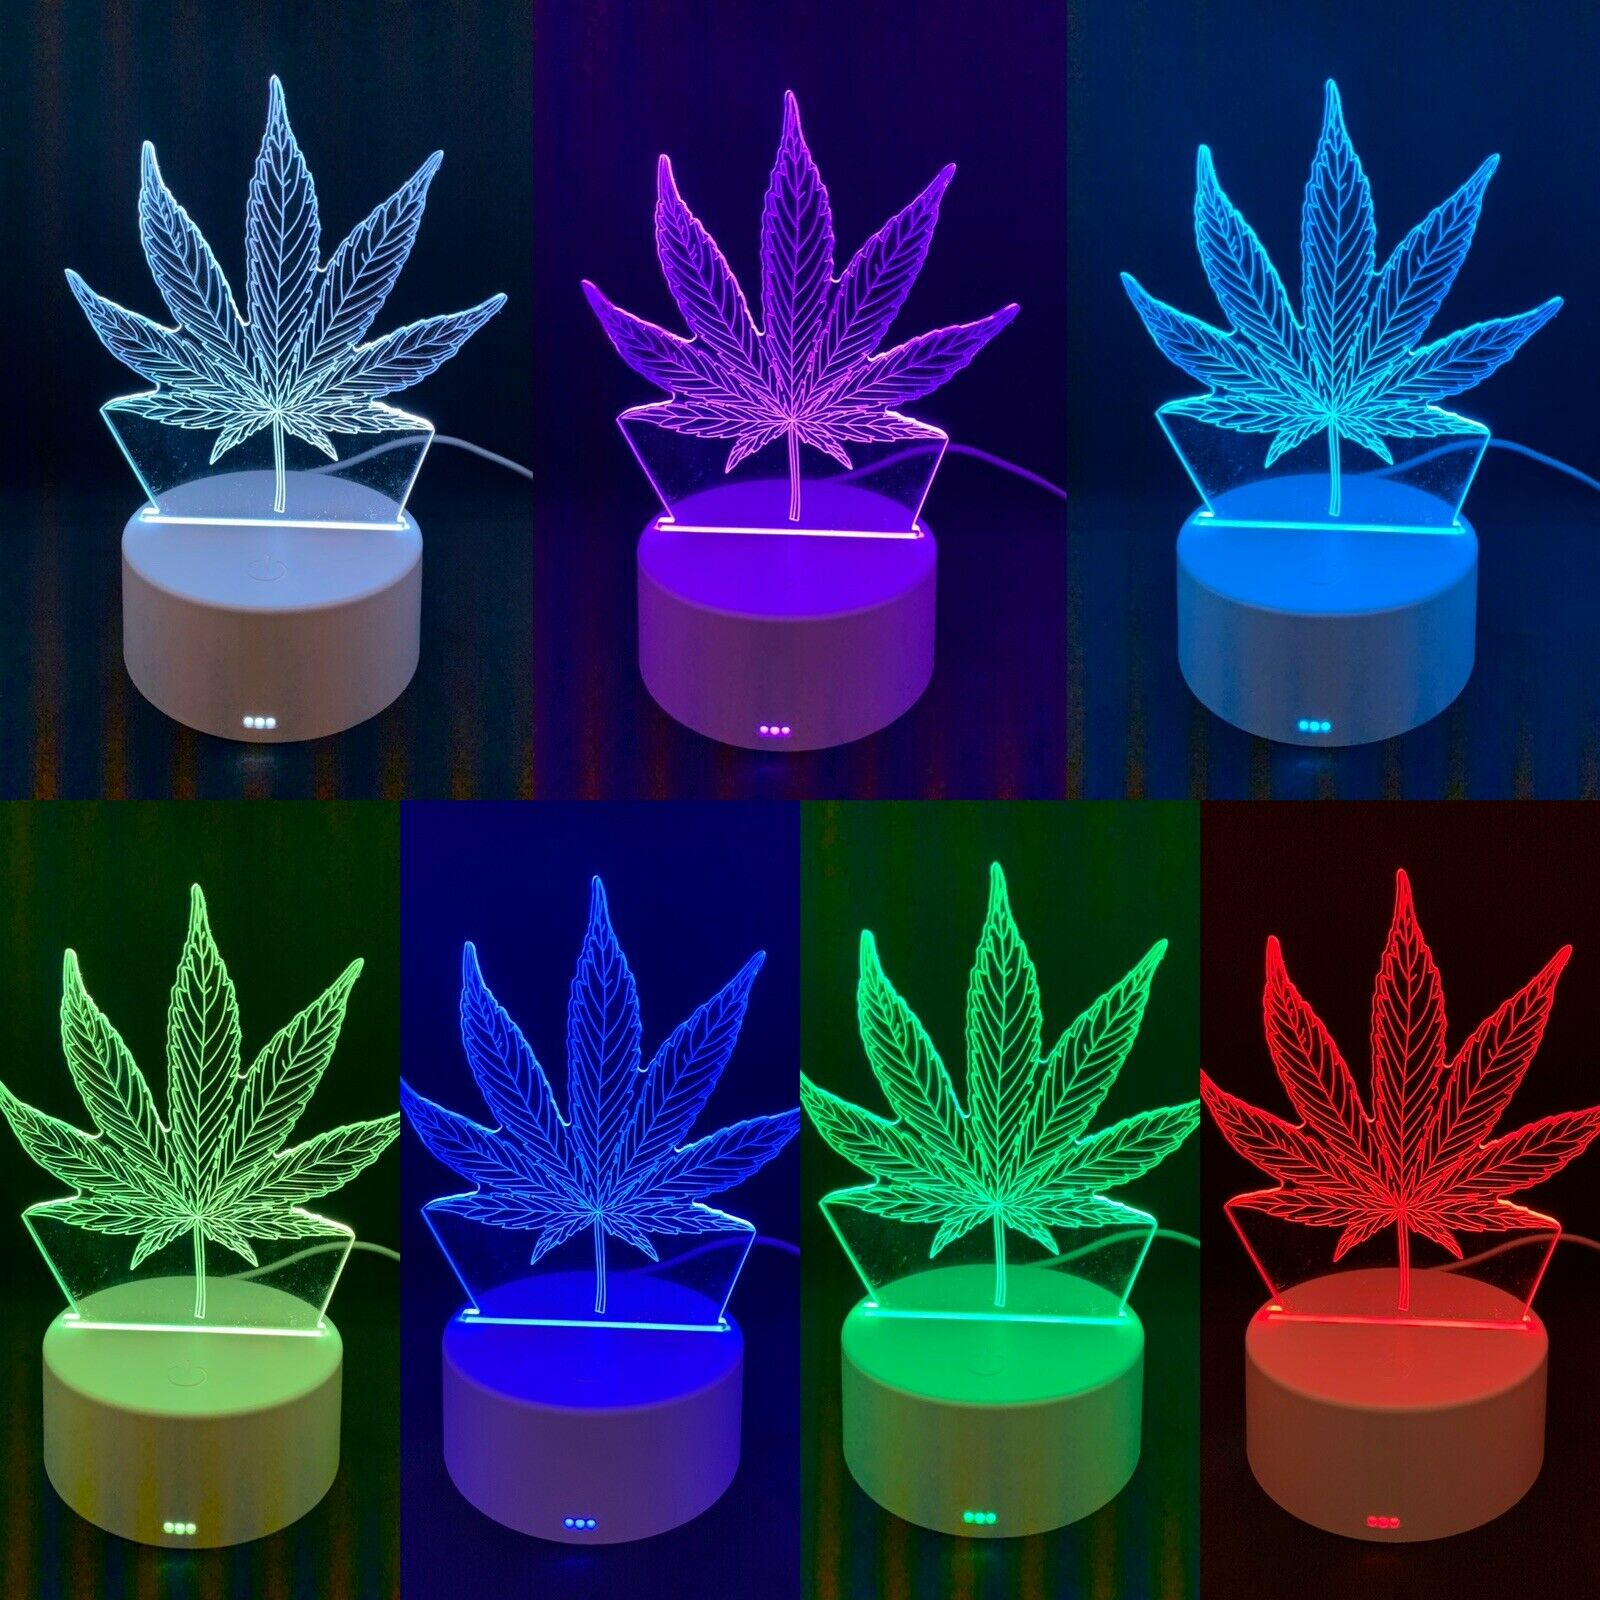 3D illusion Visual Night Light LED Desk Table Lamp Bedroom Home Decors Kids Gift